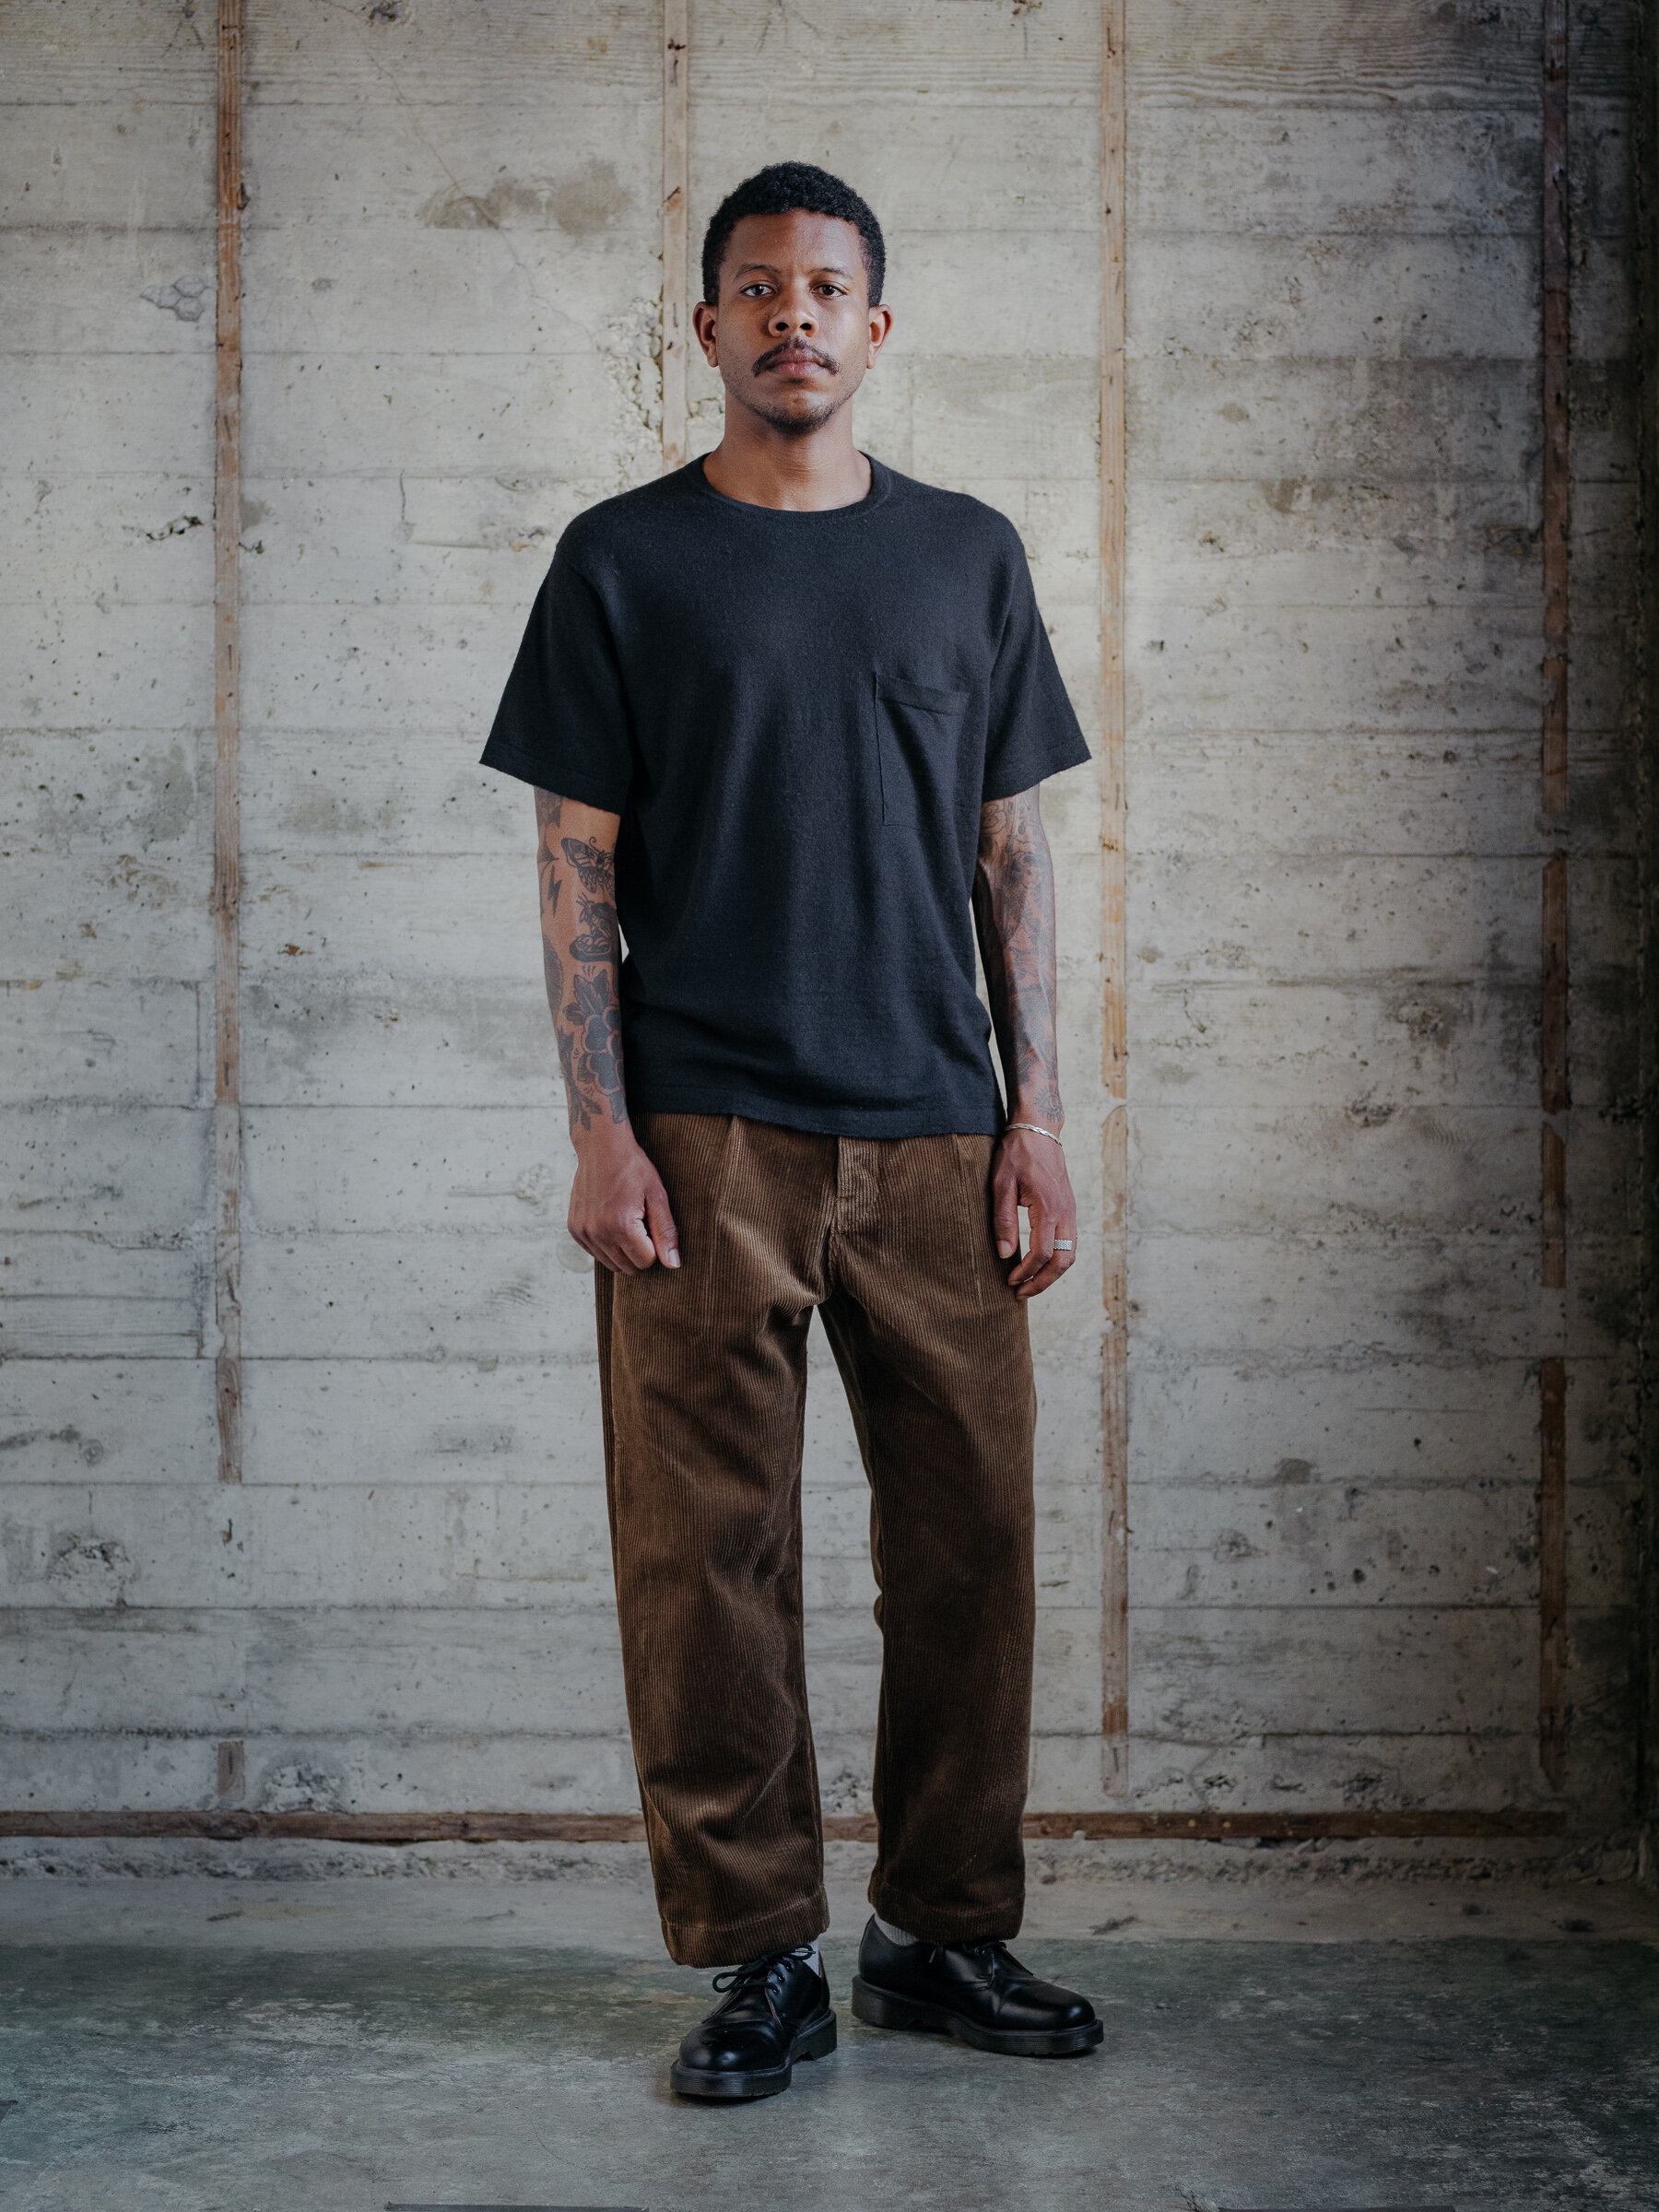 evan-kinori-pocket-tee-sweater-cashmere-linen-silk-made-in-italy-1